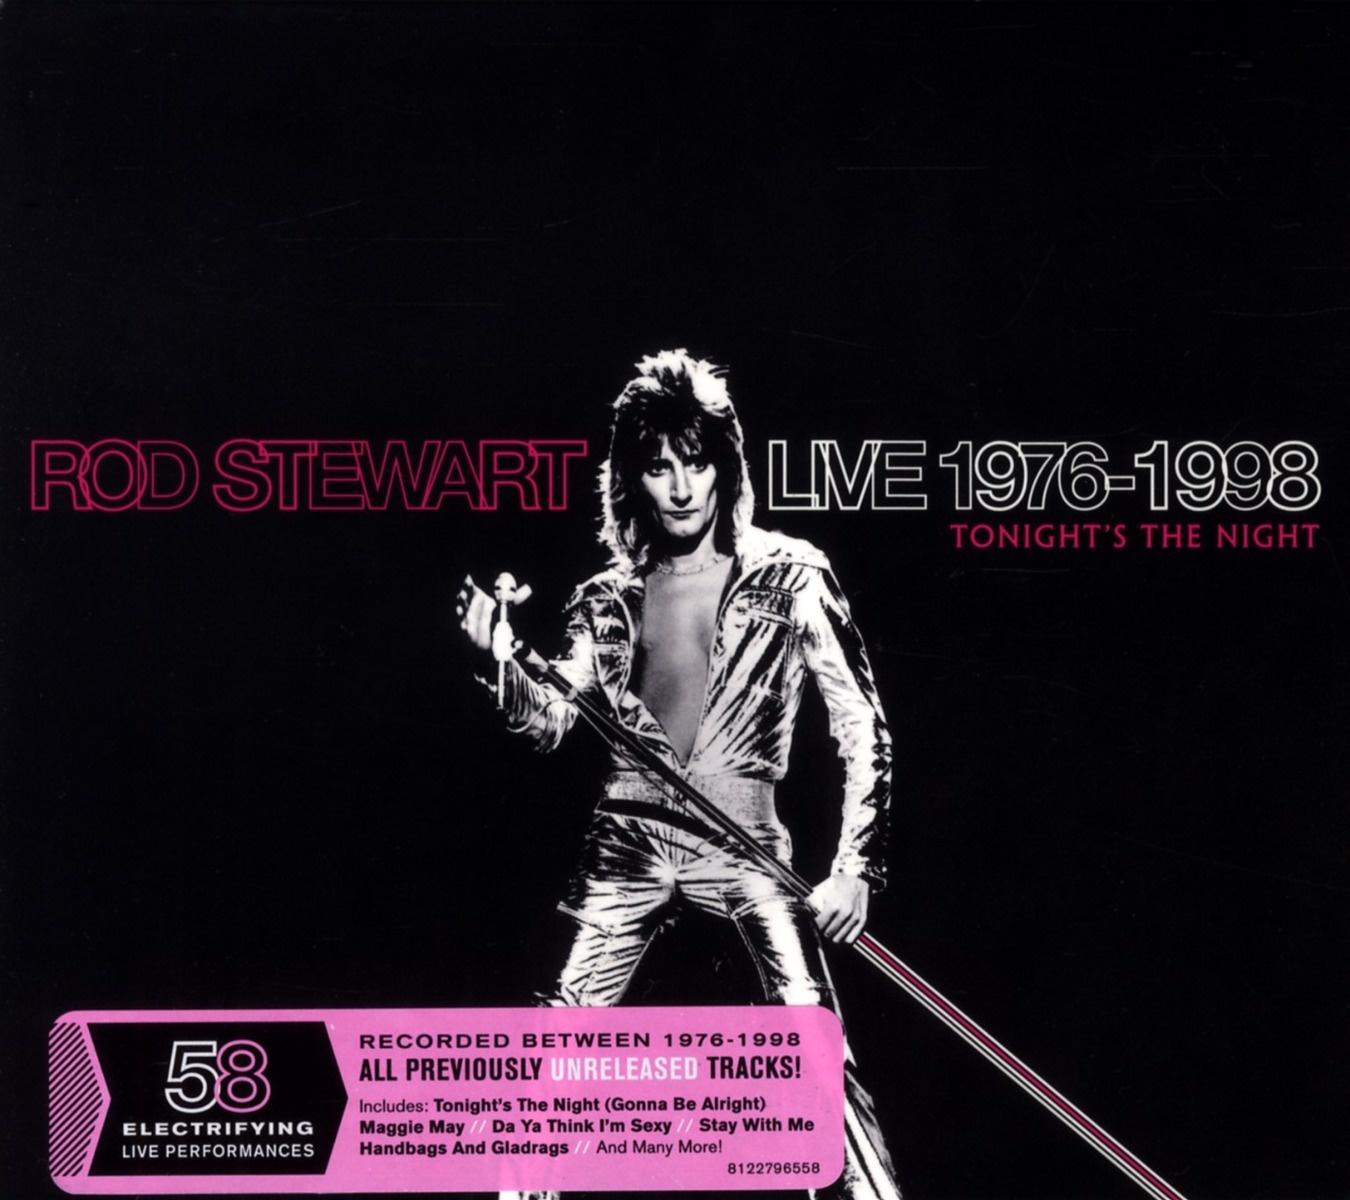 Tonight's the night (gonna be alright) (Foto: Rod Stewart)